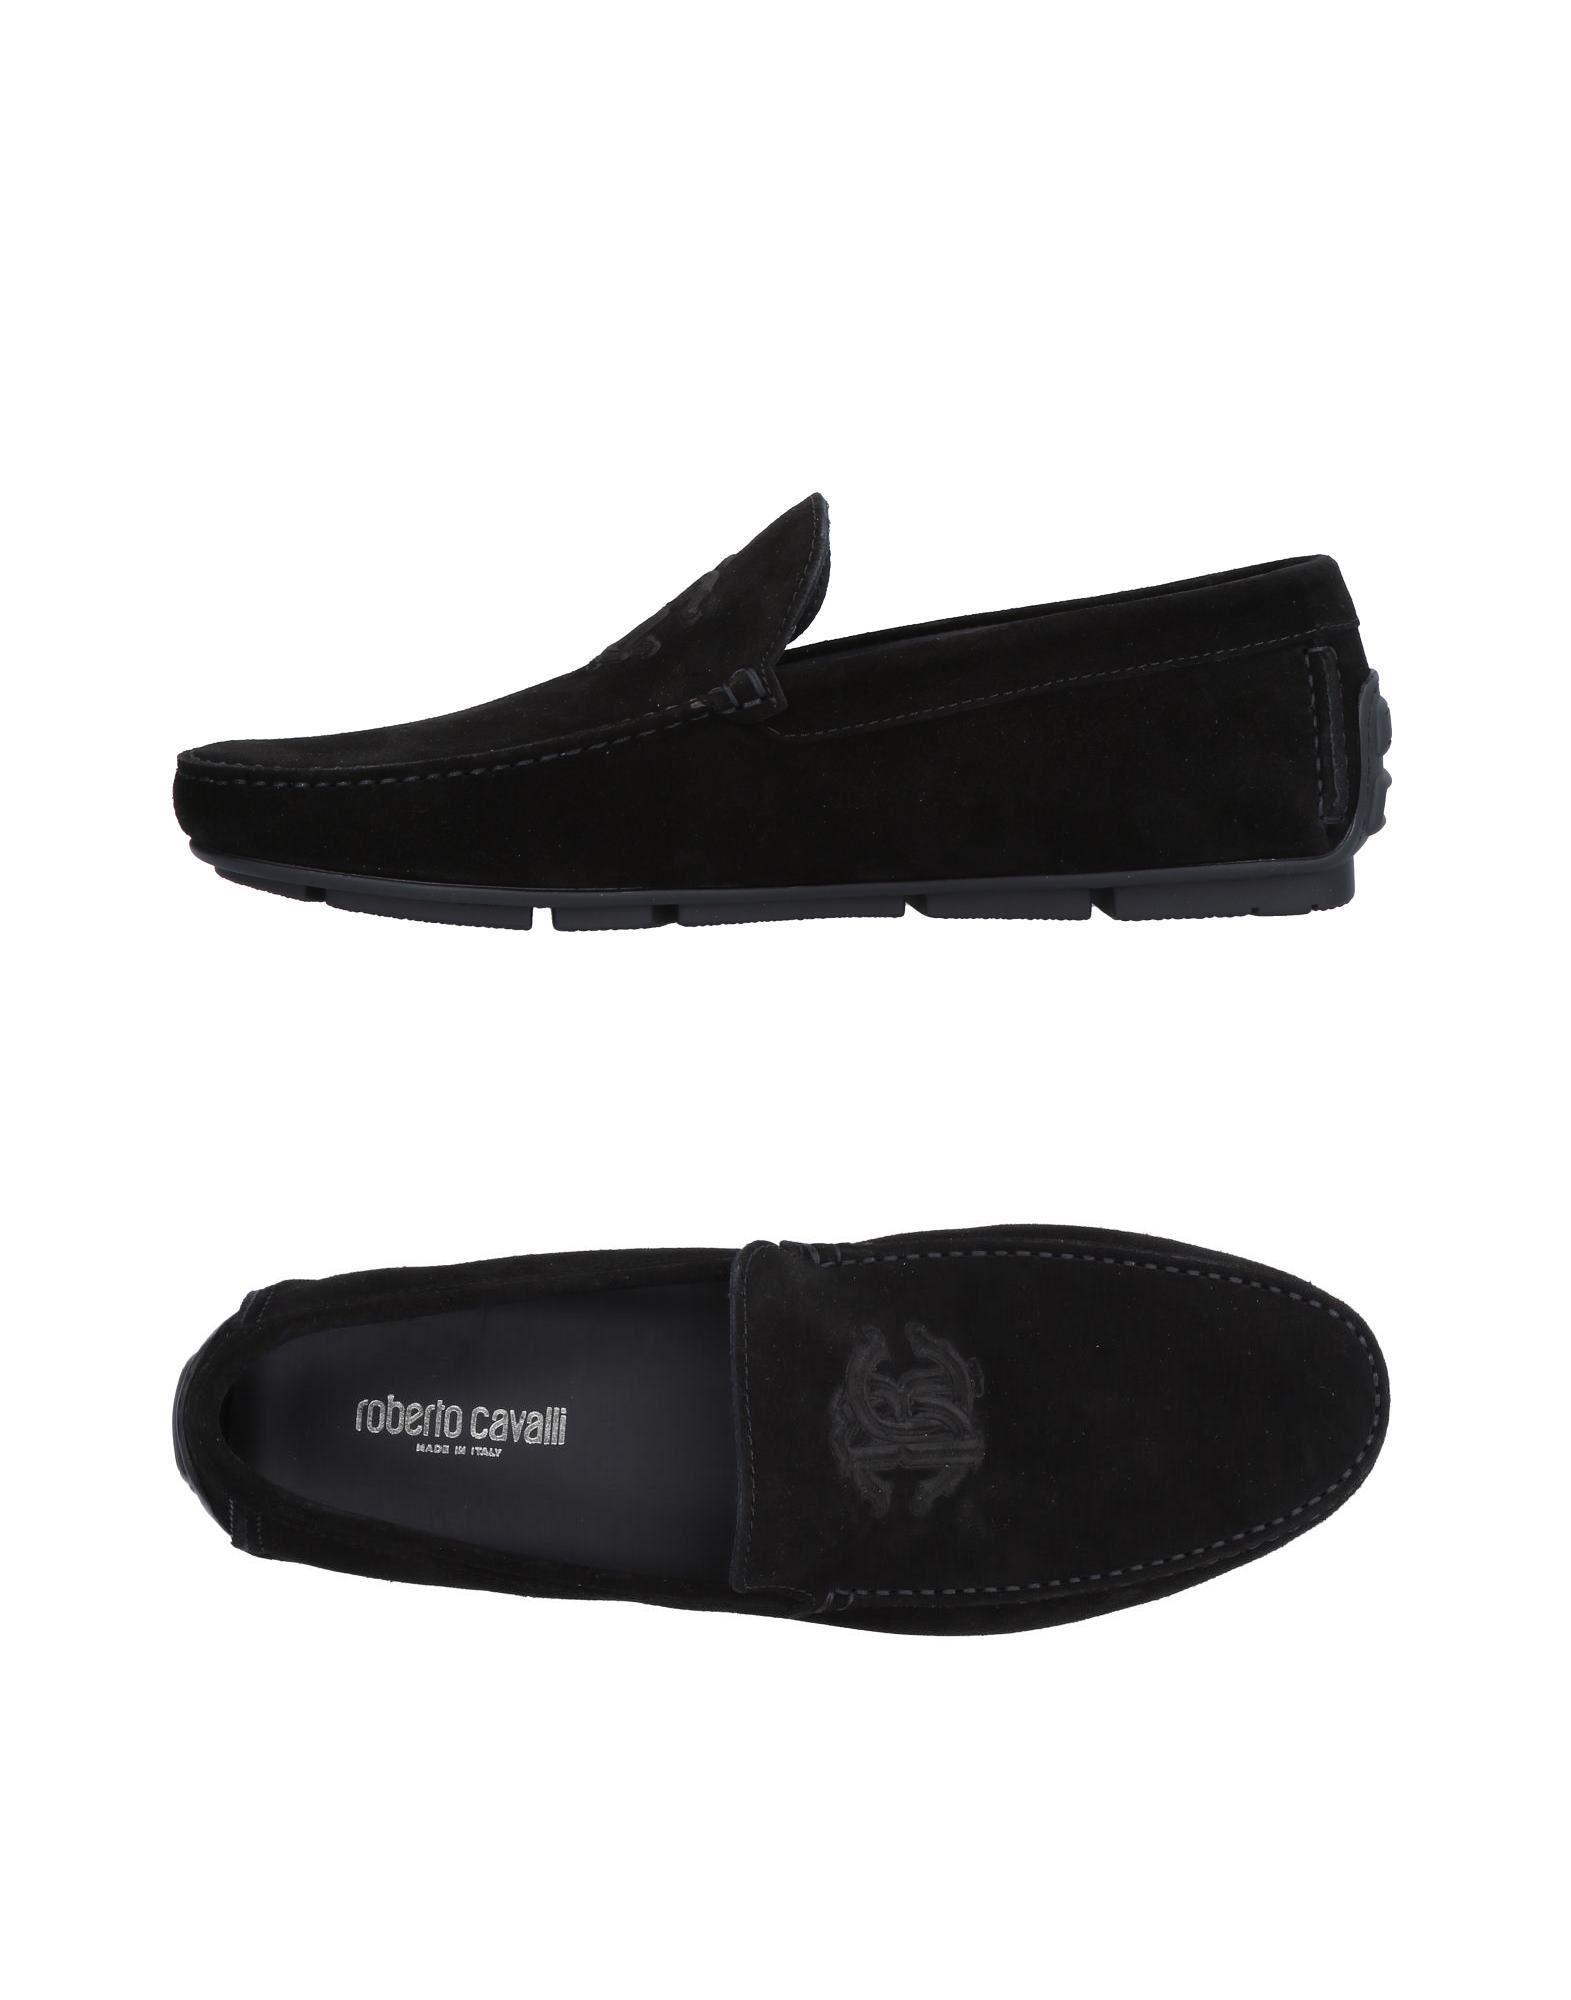 Roberto Cavalli Mokassins Herren  11517394XN Gute Qualität beliebte Schuhe